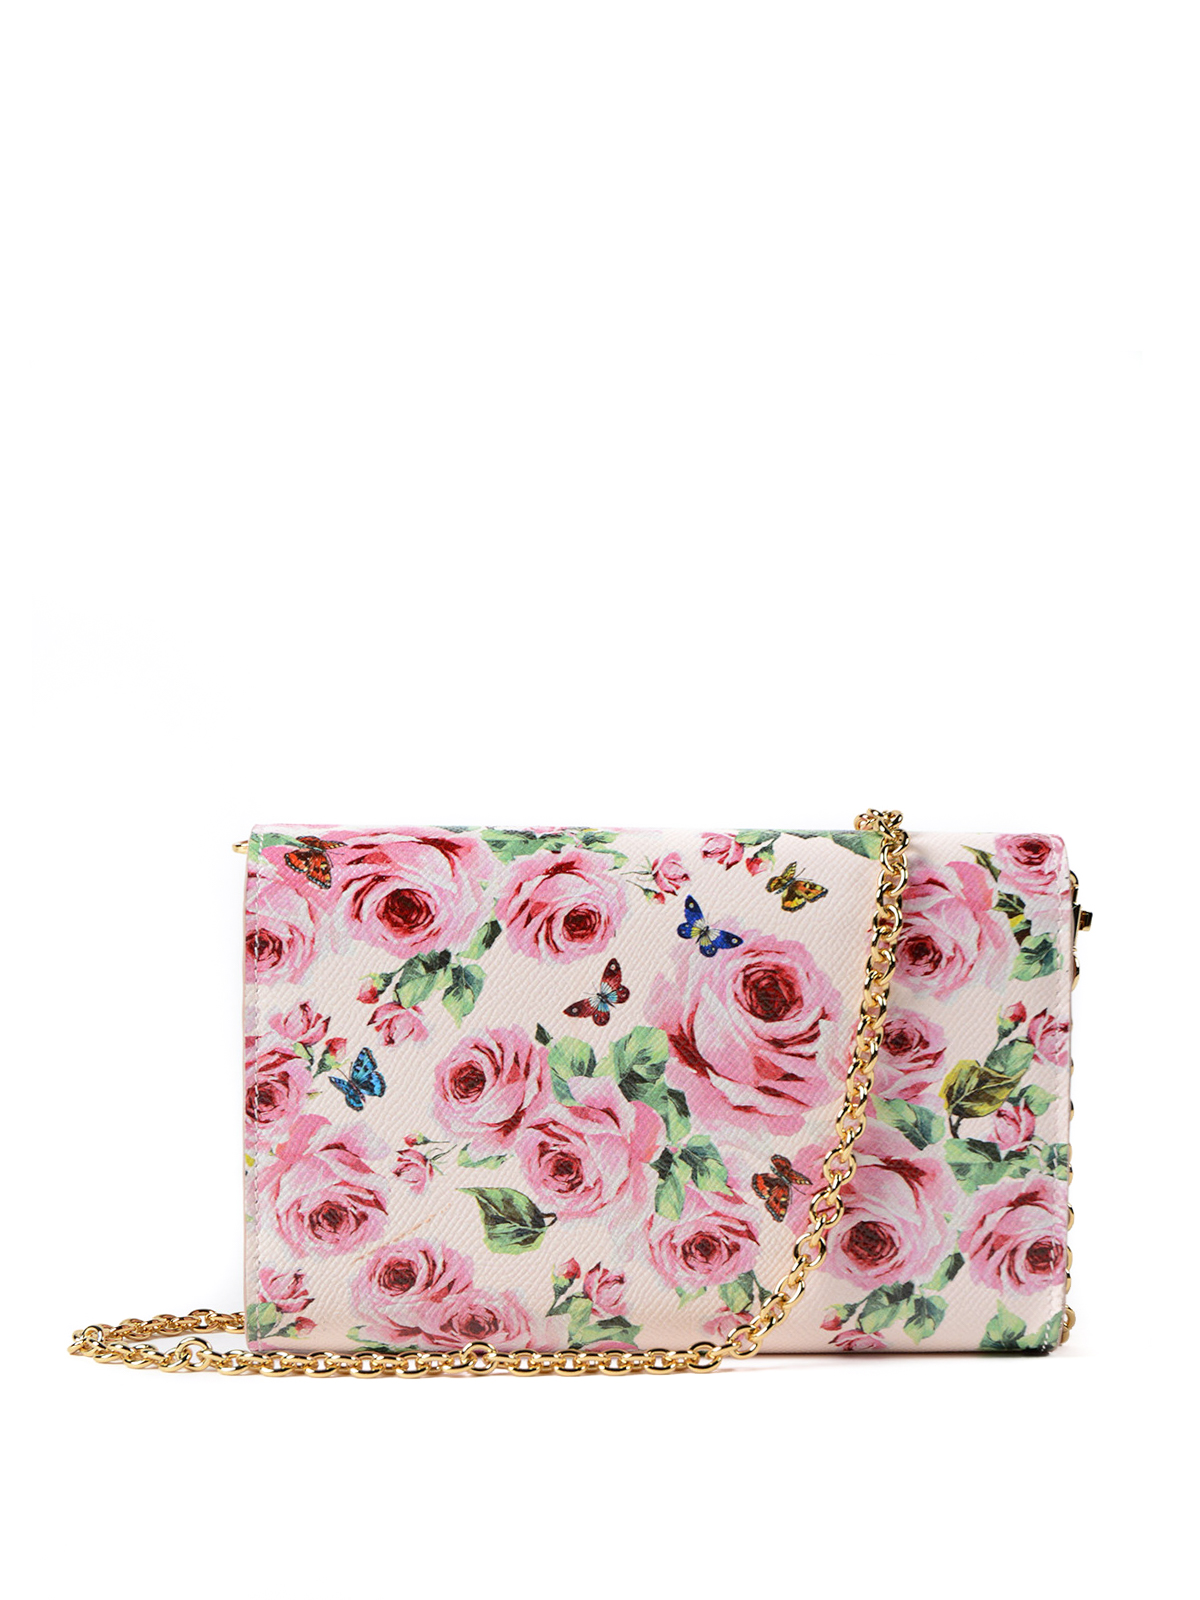 floral print wallet clutch bag - Pink & Purple Dolce & Gabbana pCHSmKg